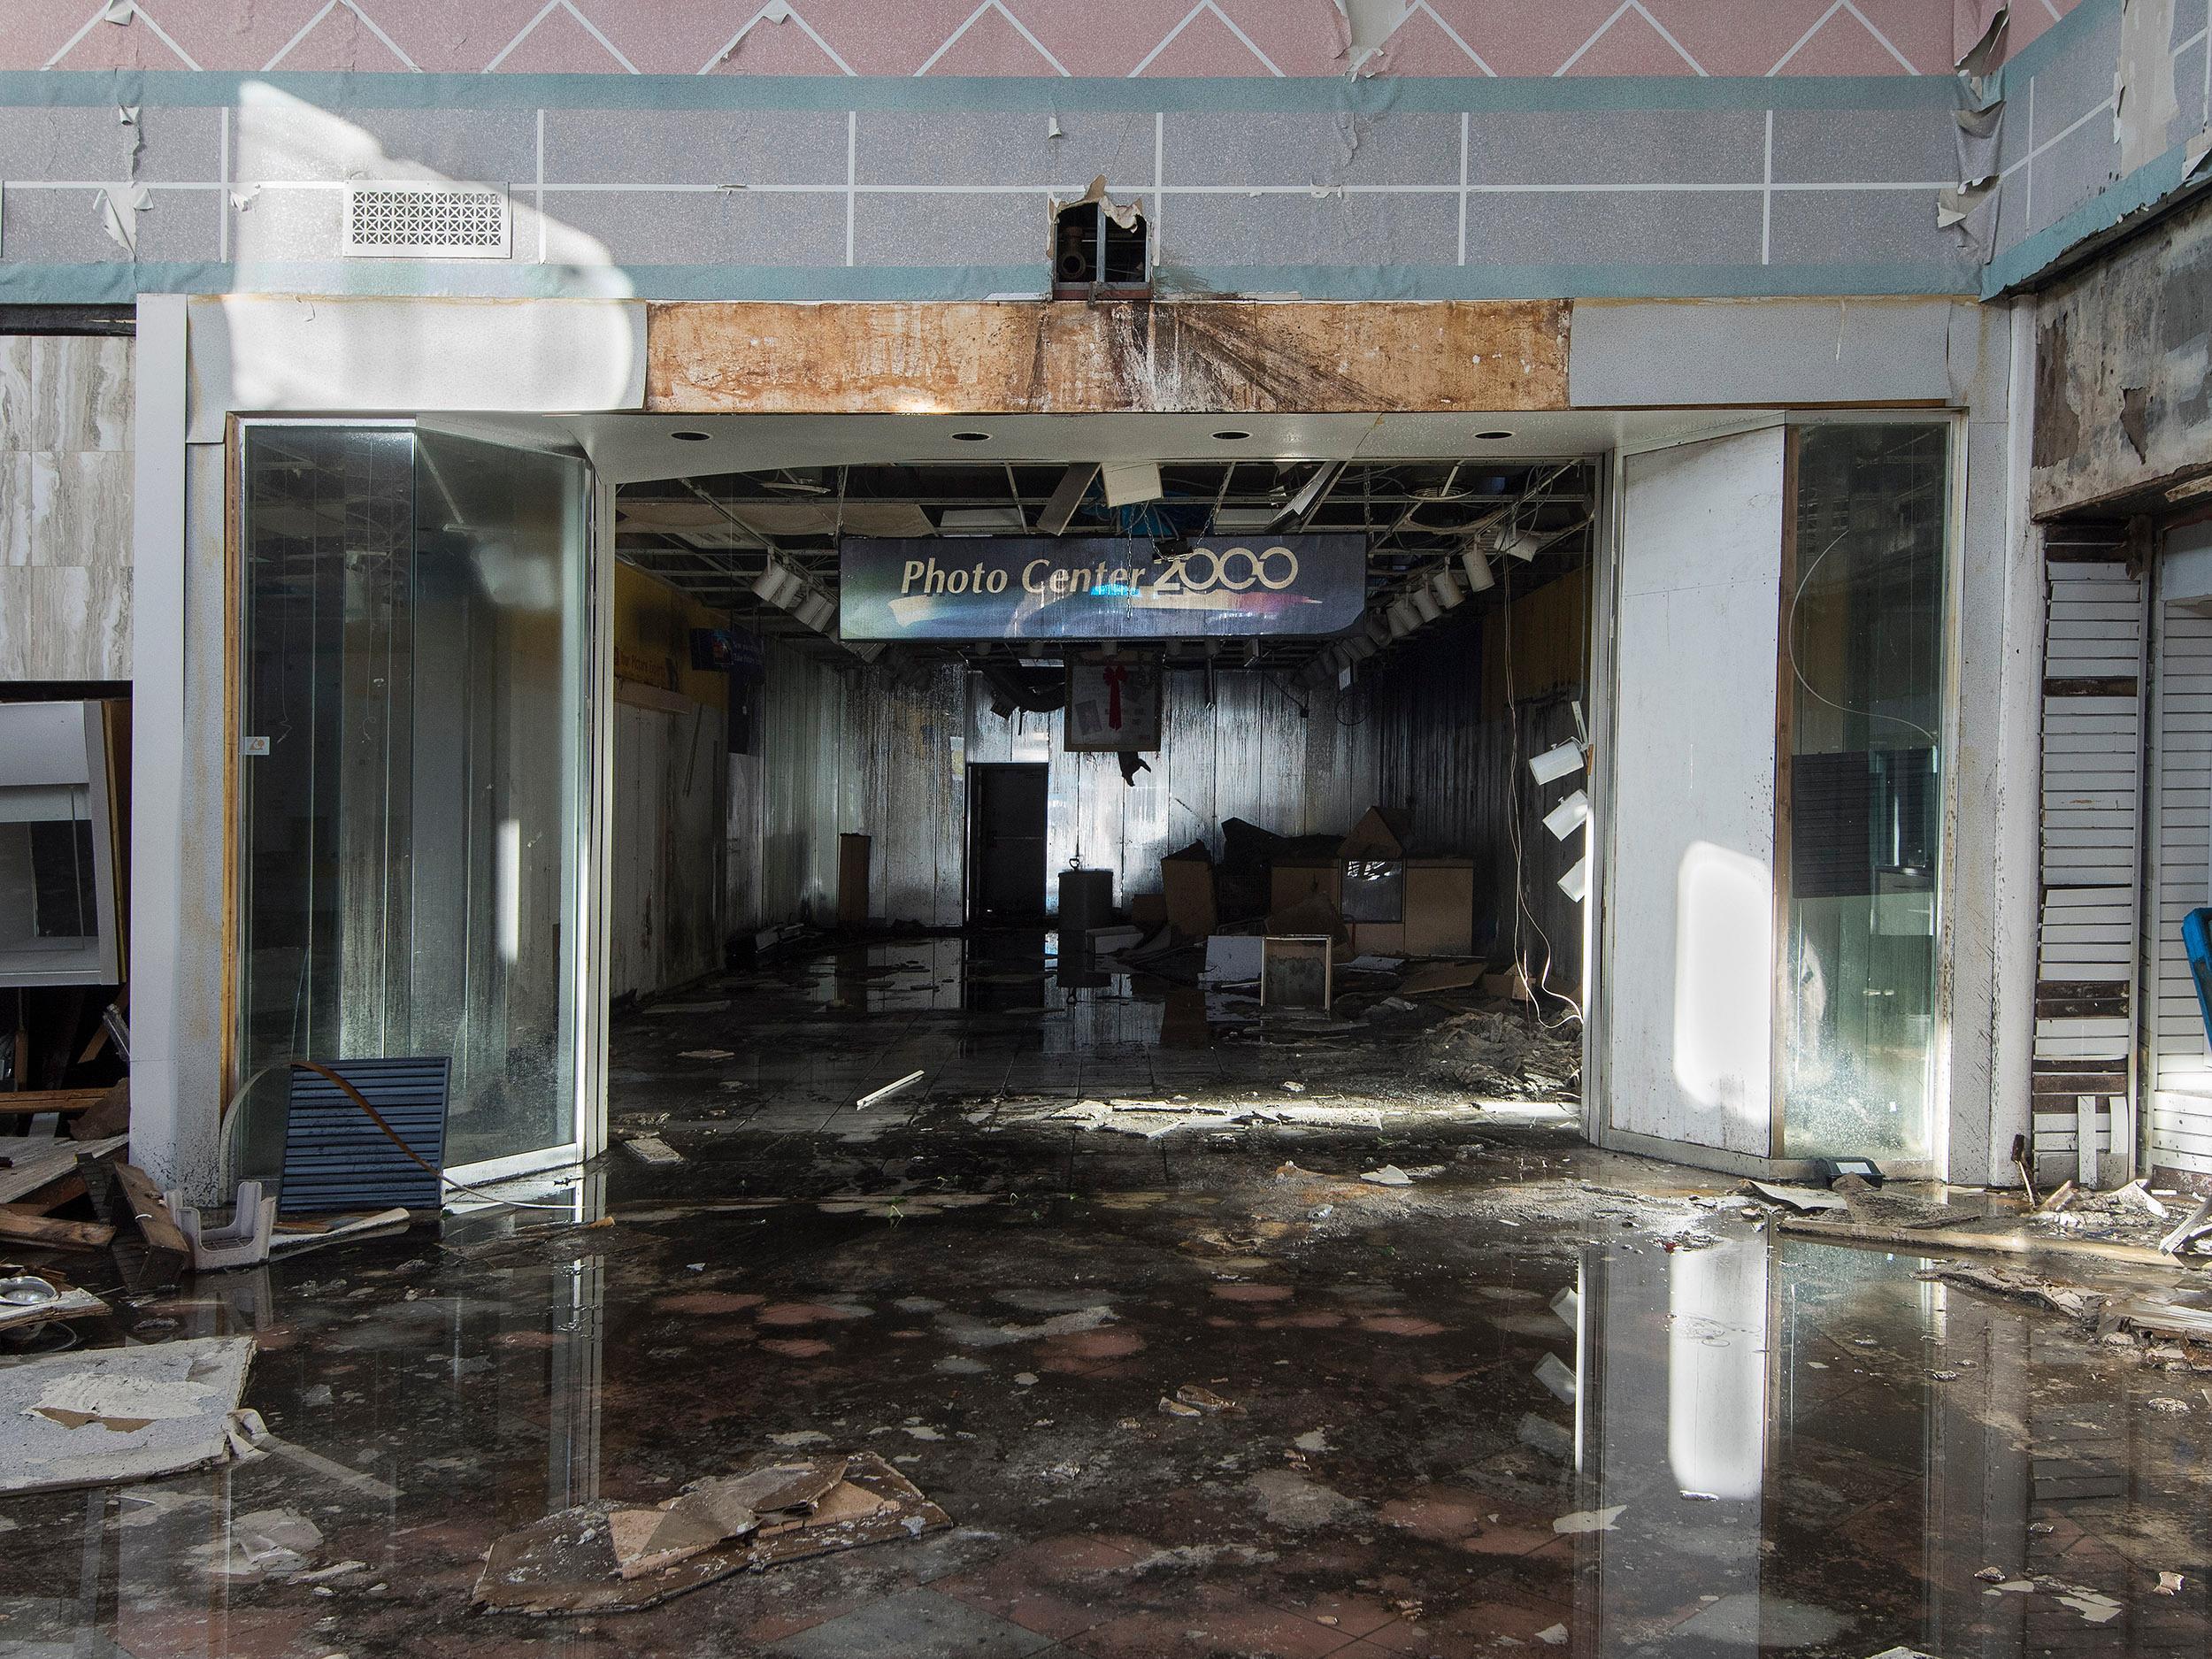 """Photocenter 2000"" Wayne Hills Mall, New Jersey (Modern Ruins) color photograph"